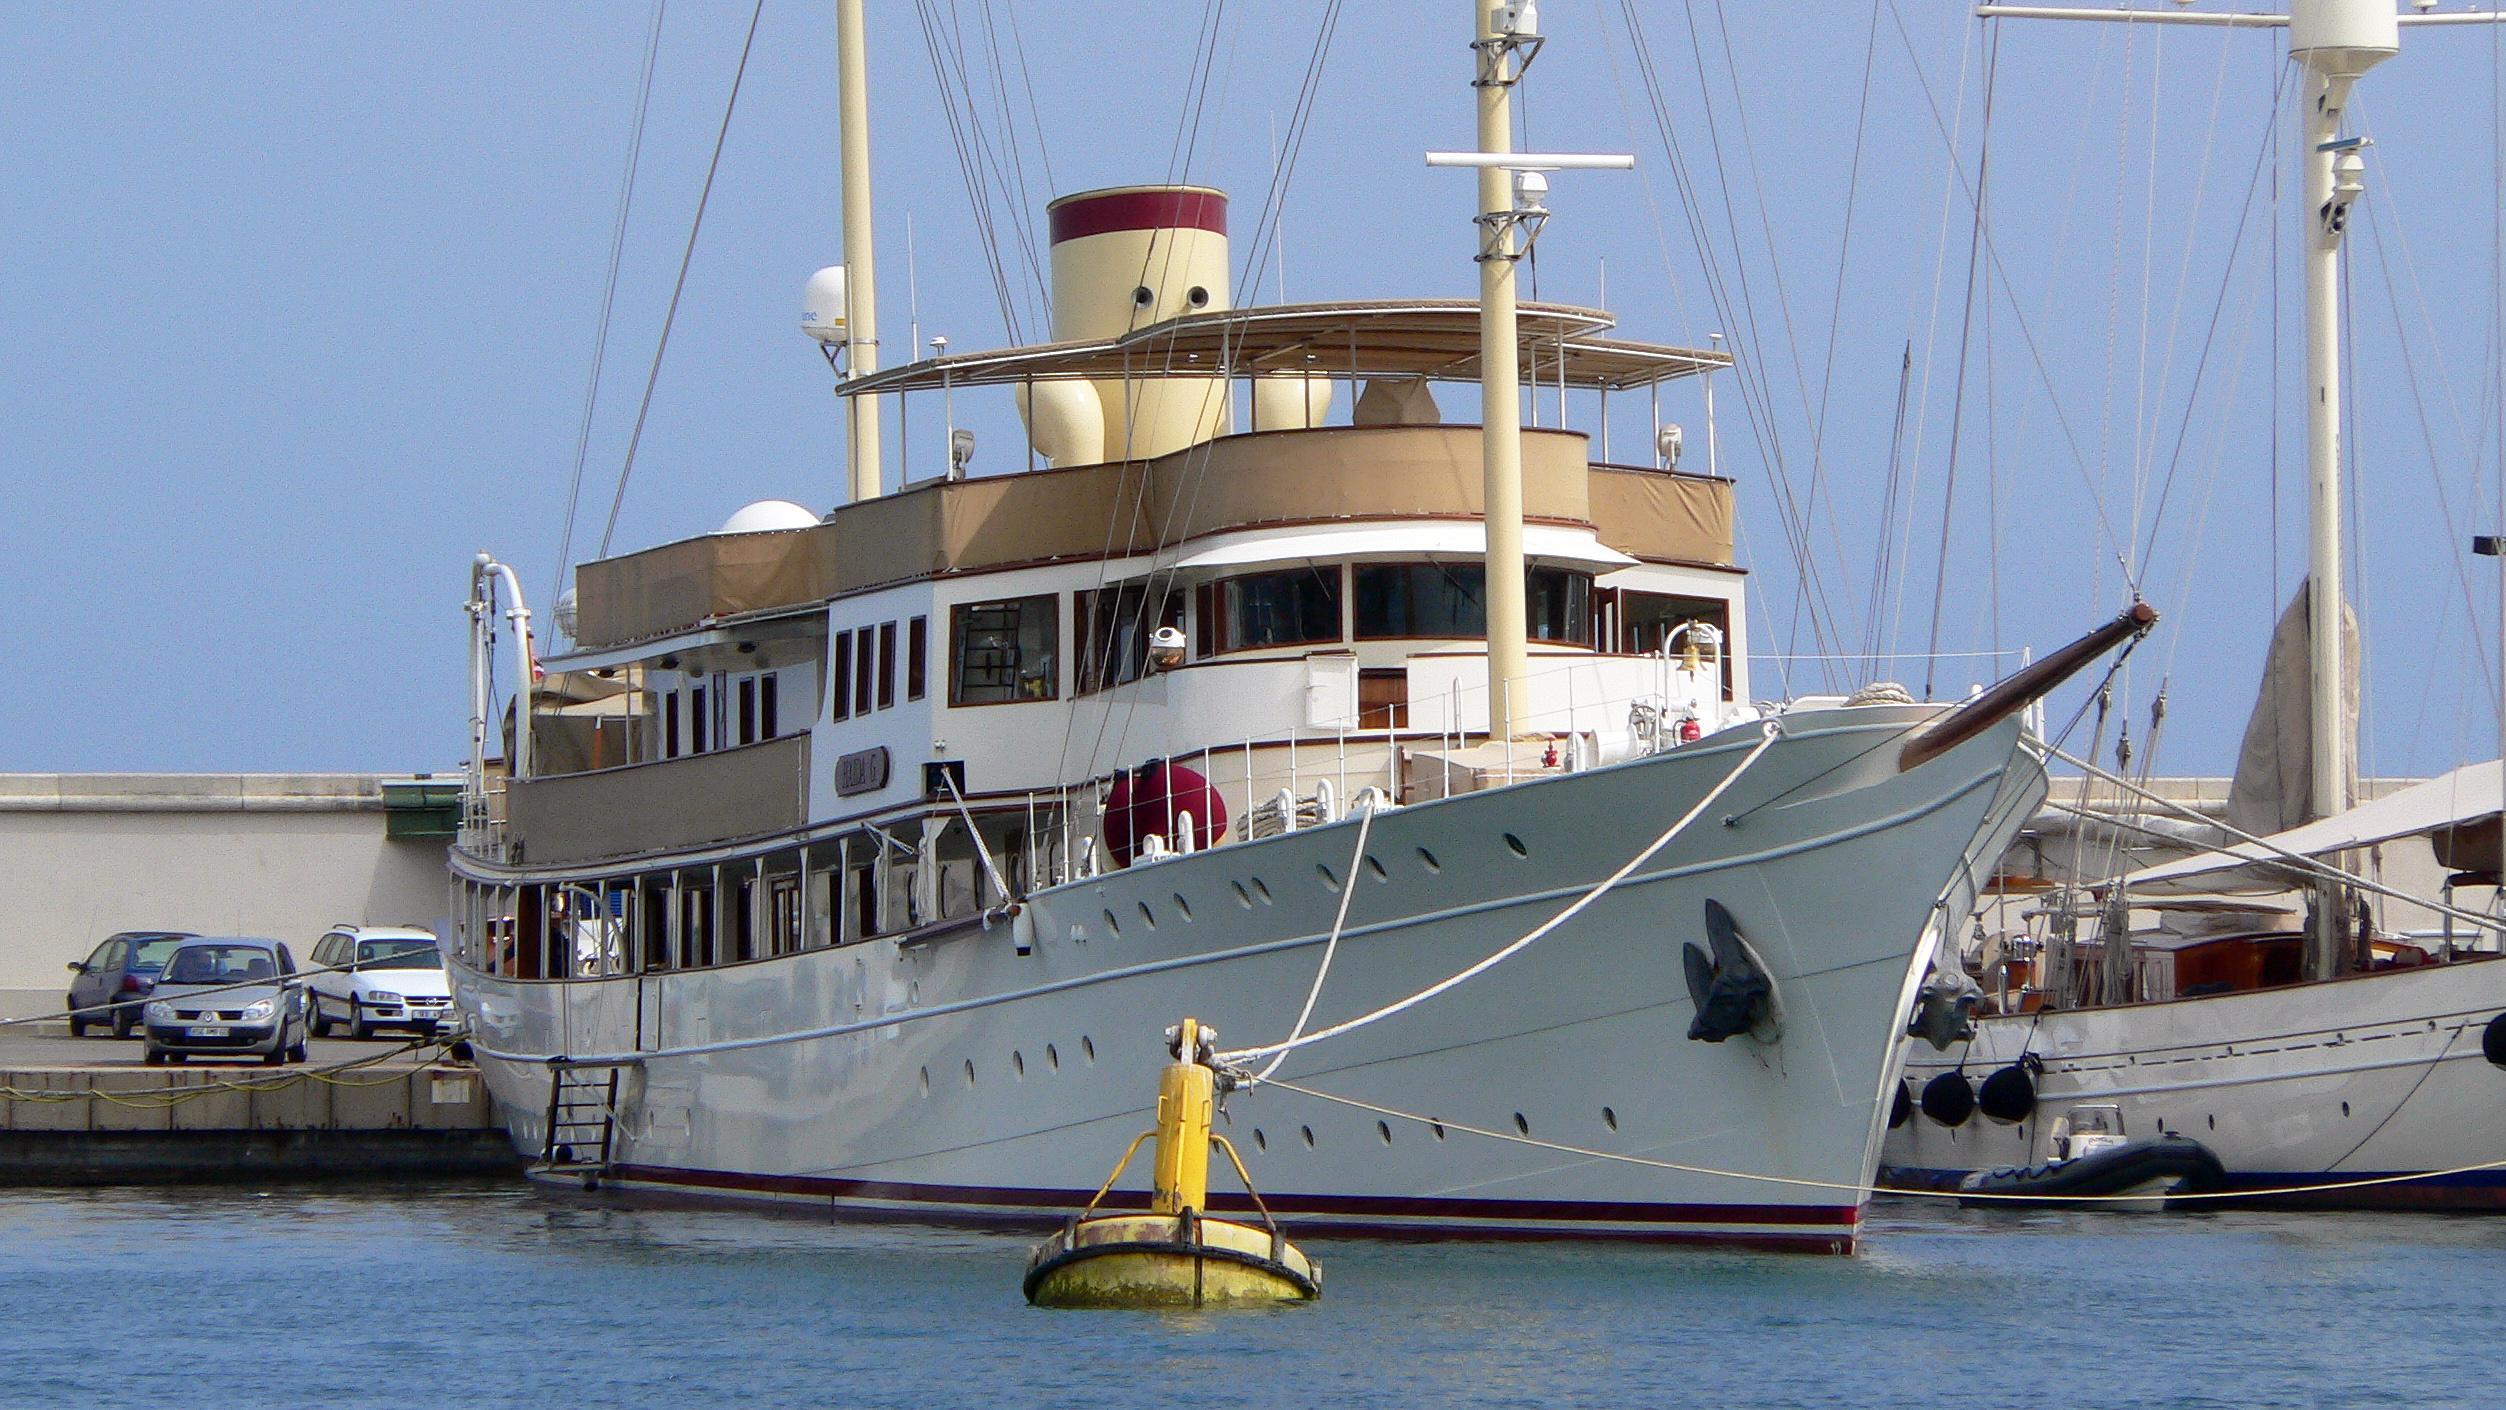 haida-1929-dona-amelia-motor-yacht-krupp-germaniawerft-1929-71m-bow